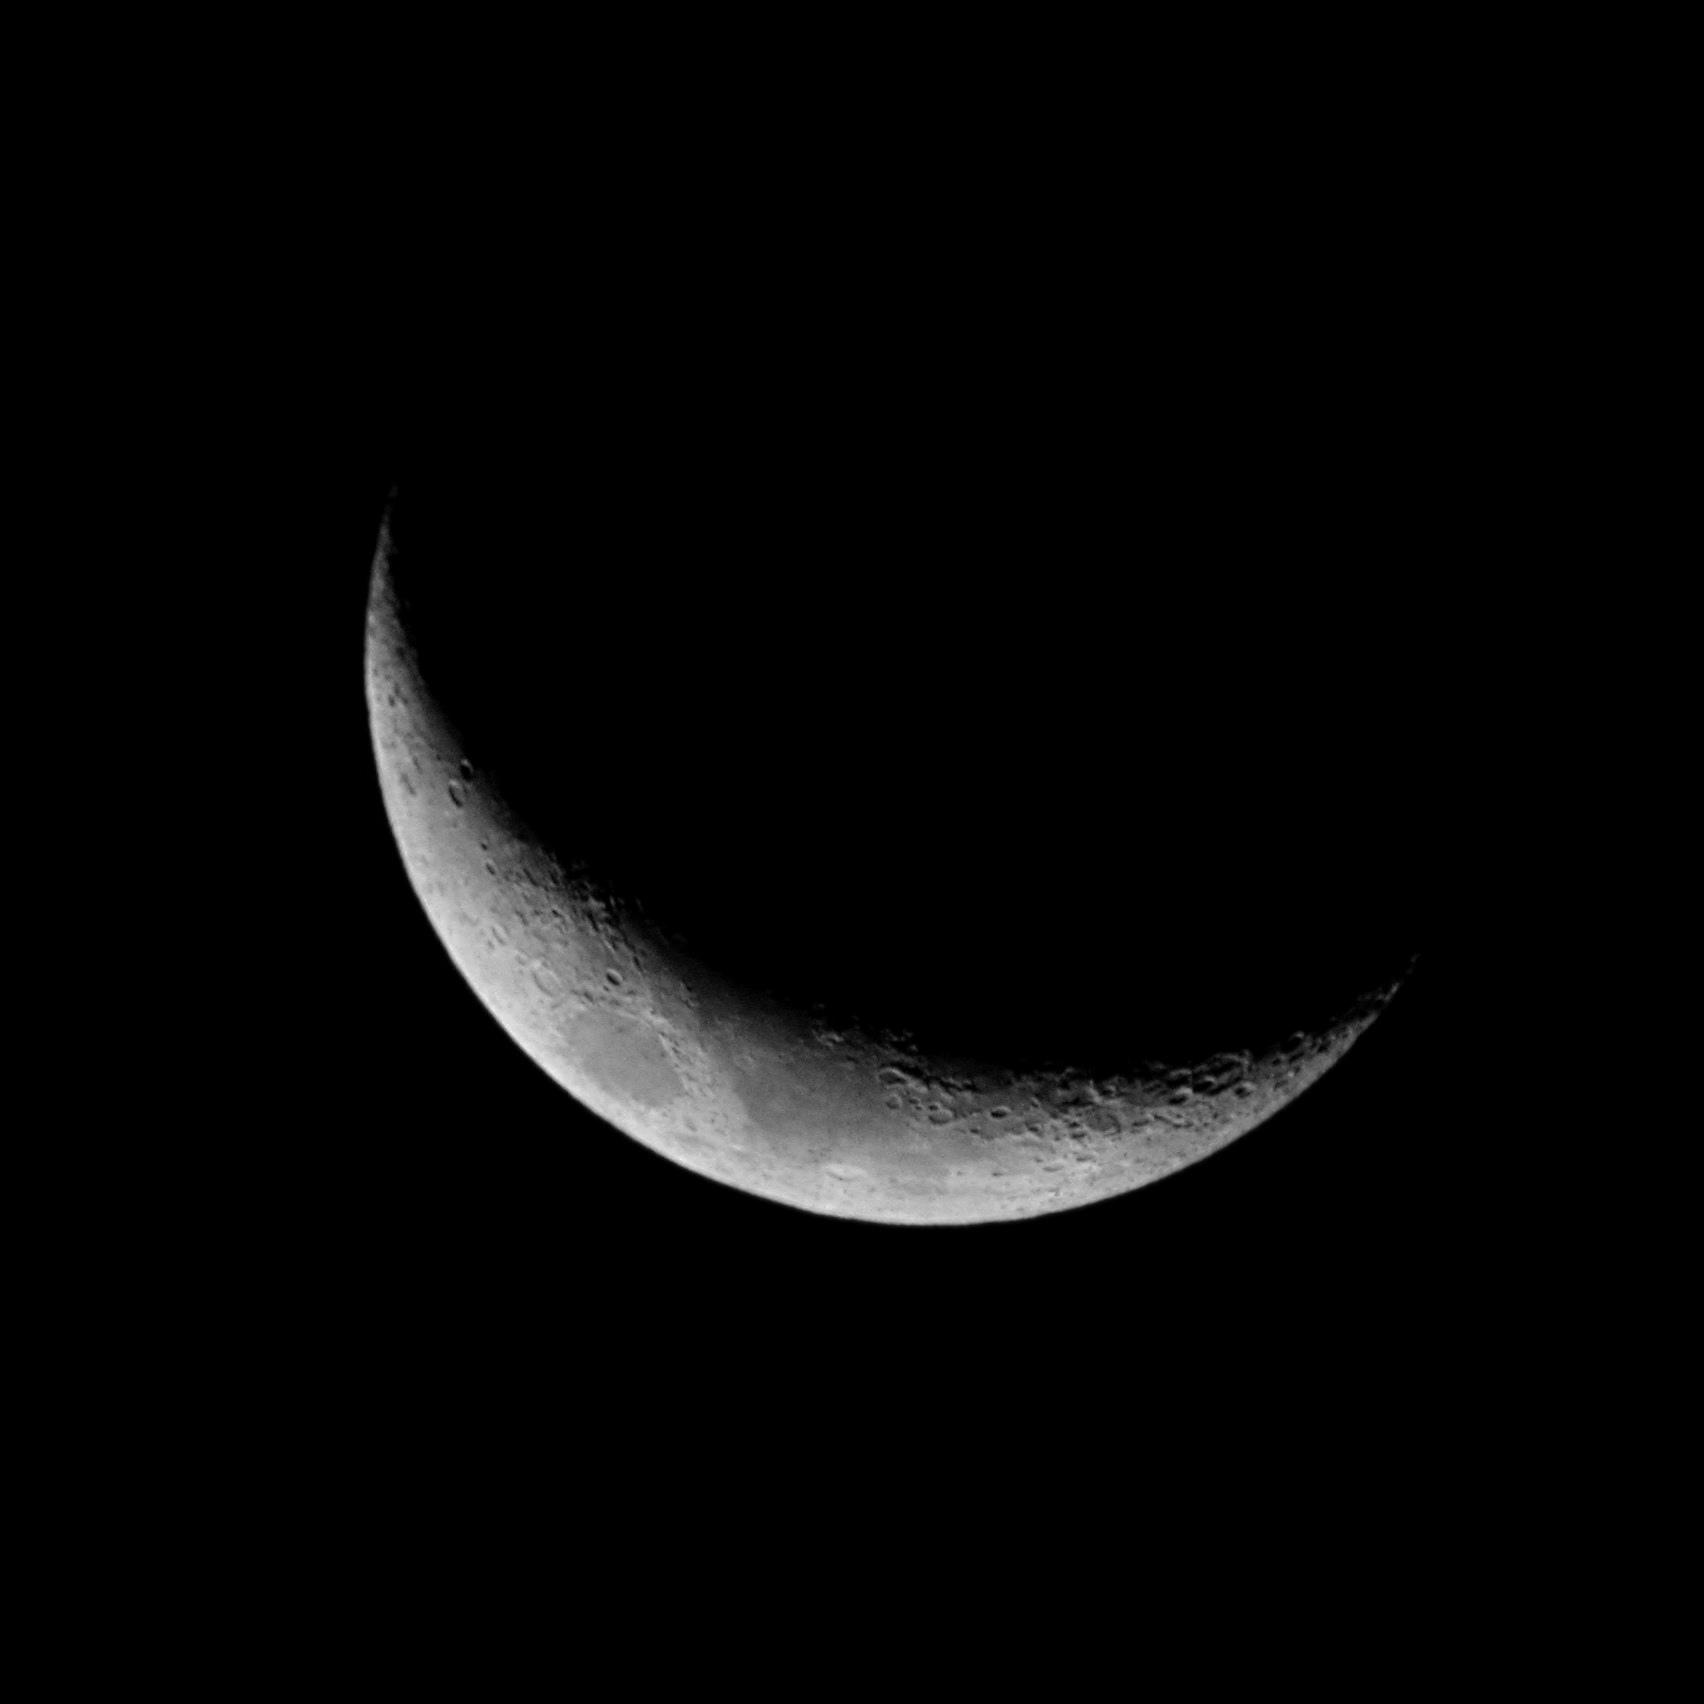 crescent-moon-2017-01-31-greyscale